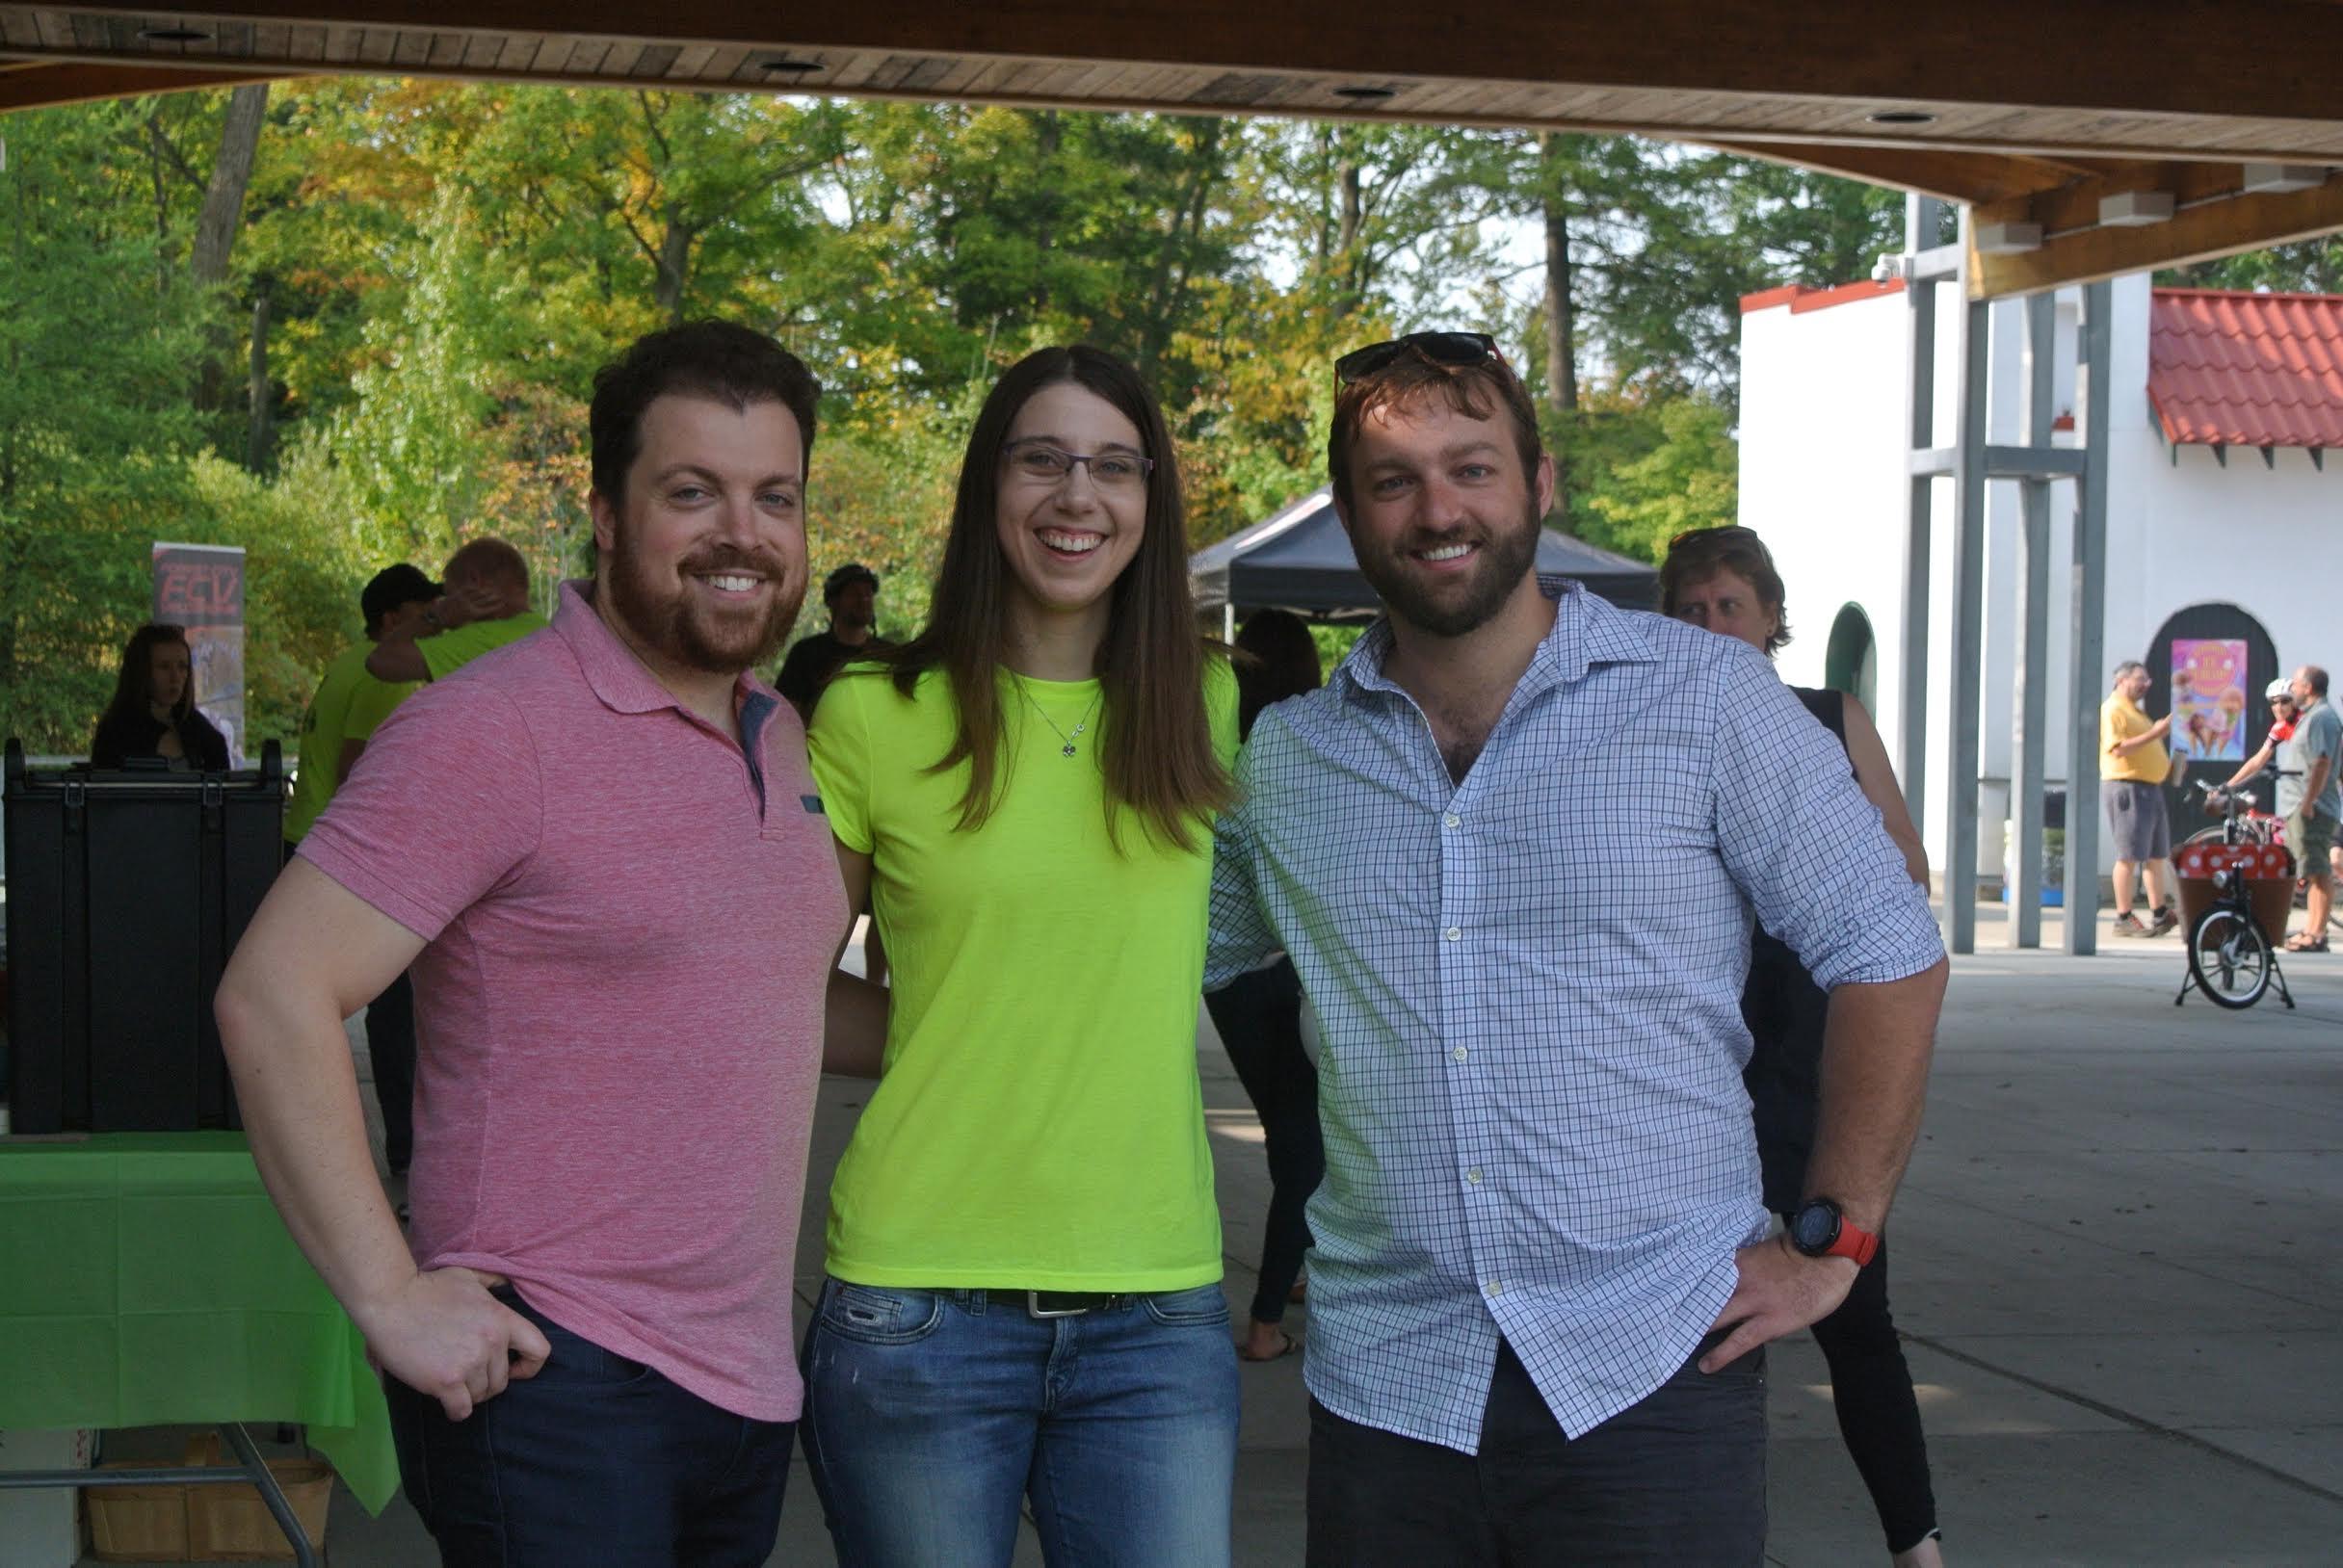 Jared, Joy, and I at Bikes N Brains 2017.